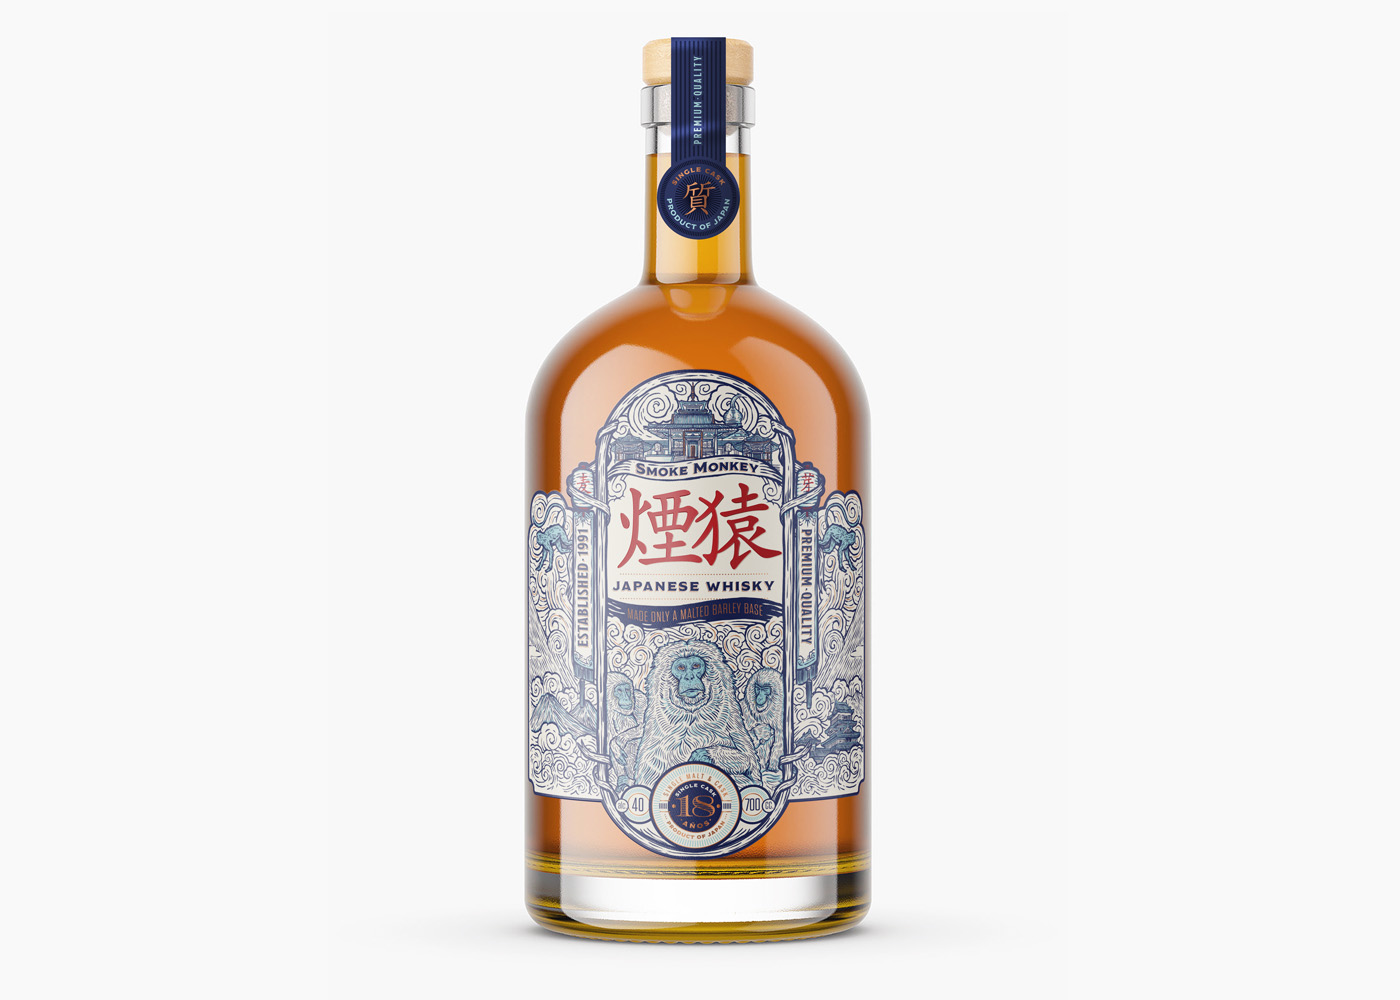 Emi renzi Creates Concept for a Single Cask 18 Years Japanese Whiskey